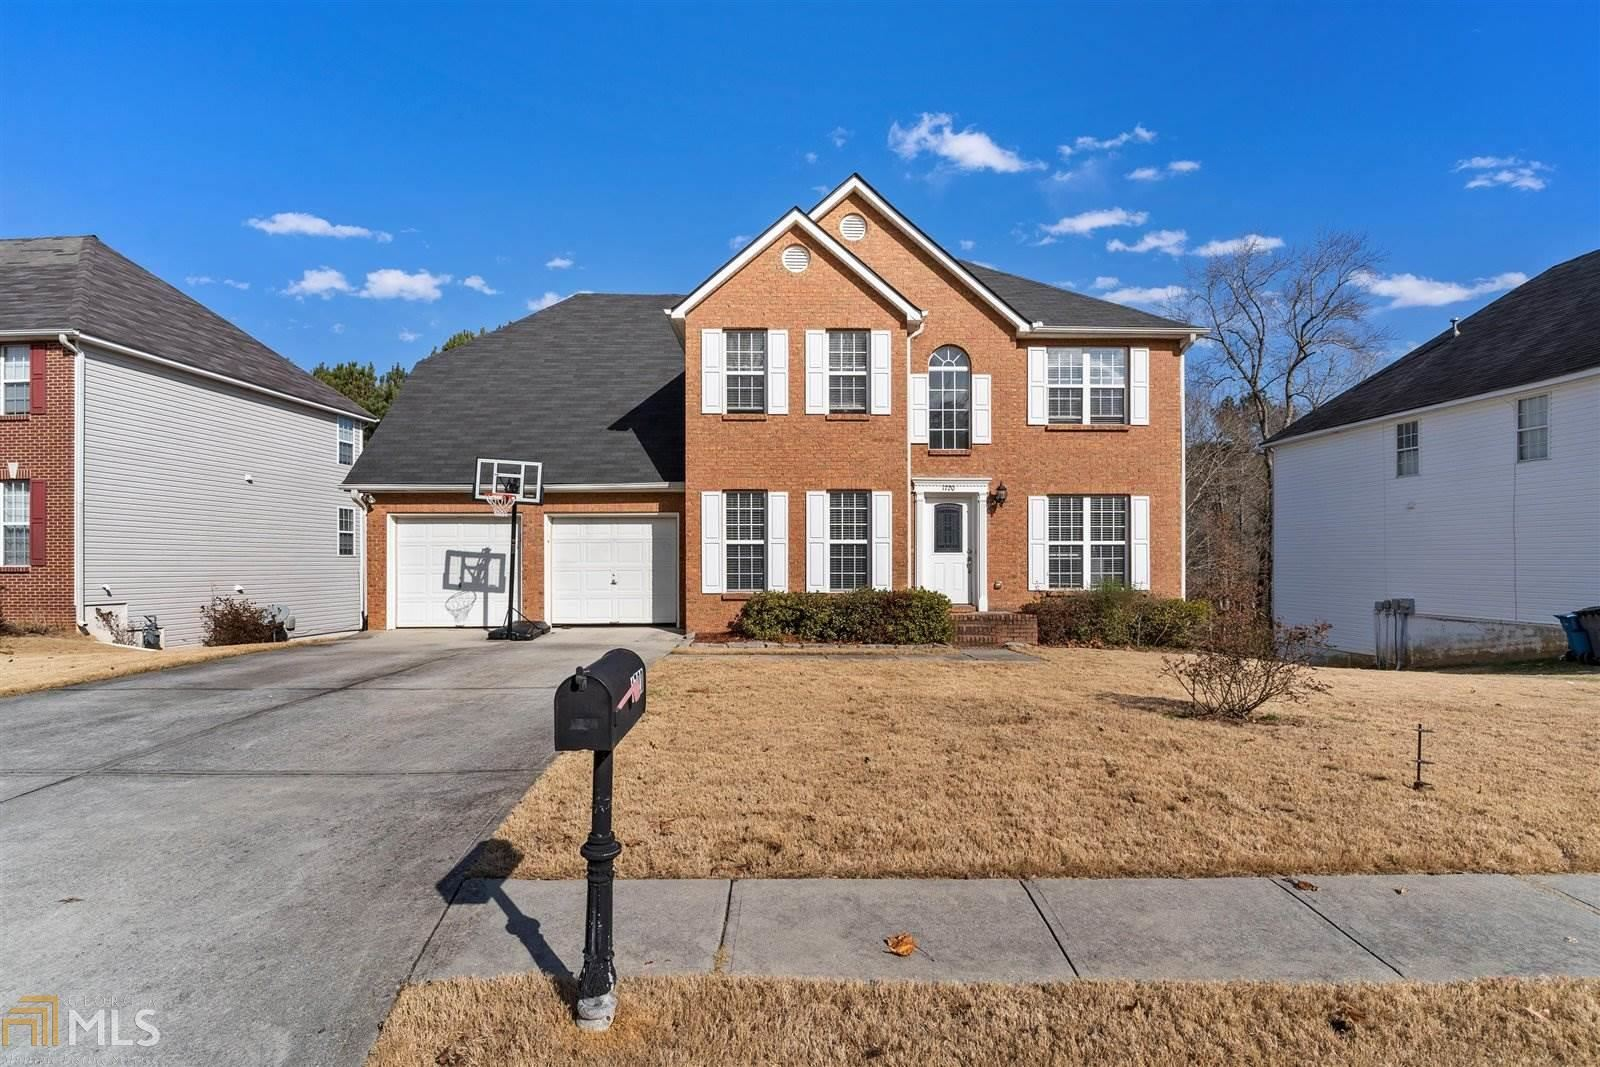 1720 Pinehurst Vw, Grayson, GA 30017 - MLS#: 8890842